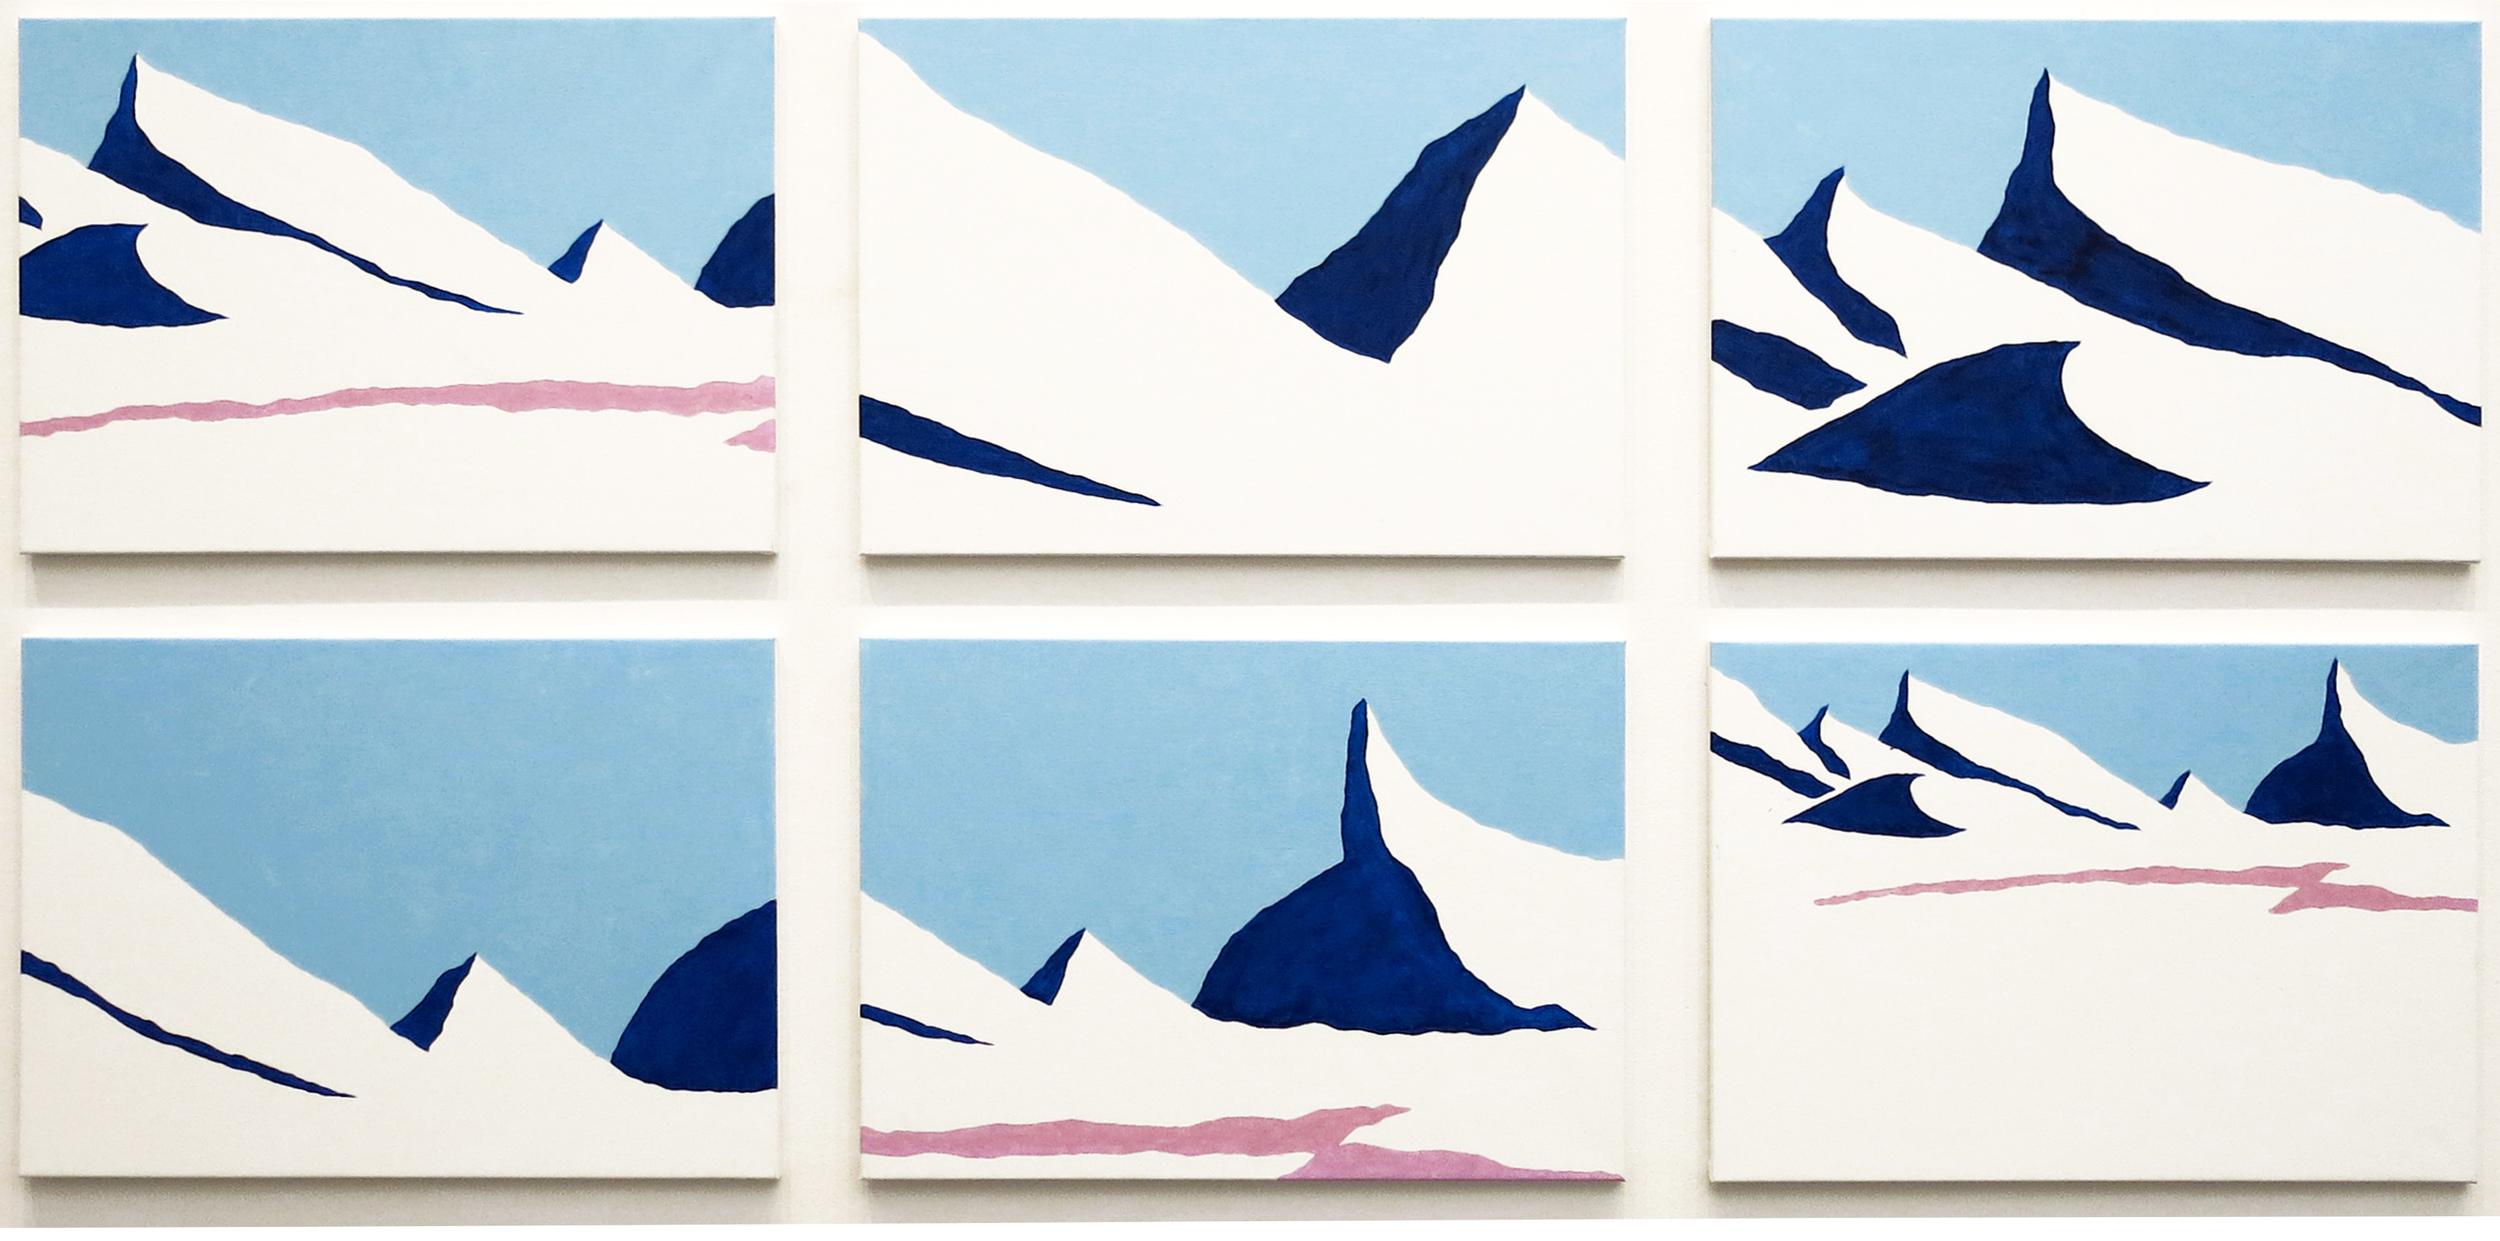 Stig Brøgger, Snelandskab (Snow Landscape), 2013, Oil on canvas, 6 parts, each63 x 90 cm